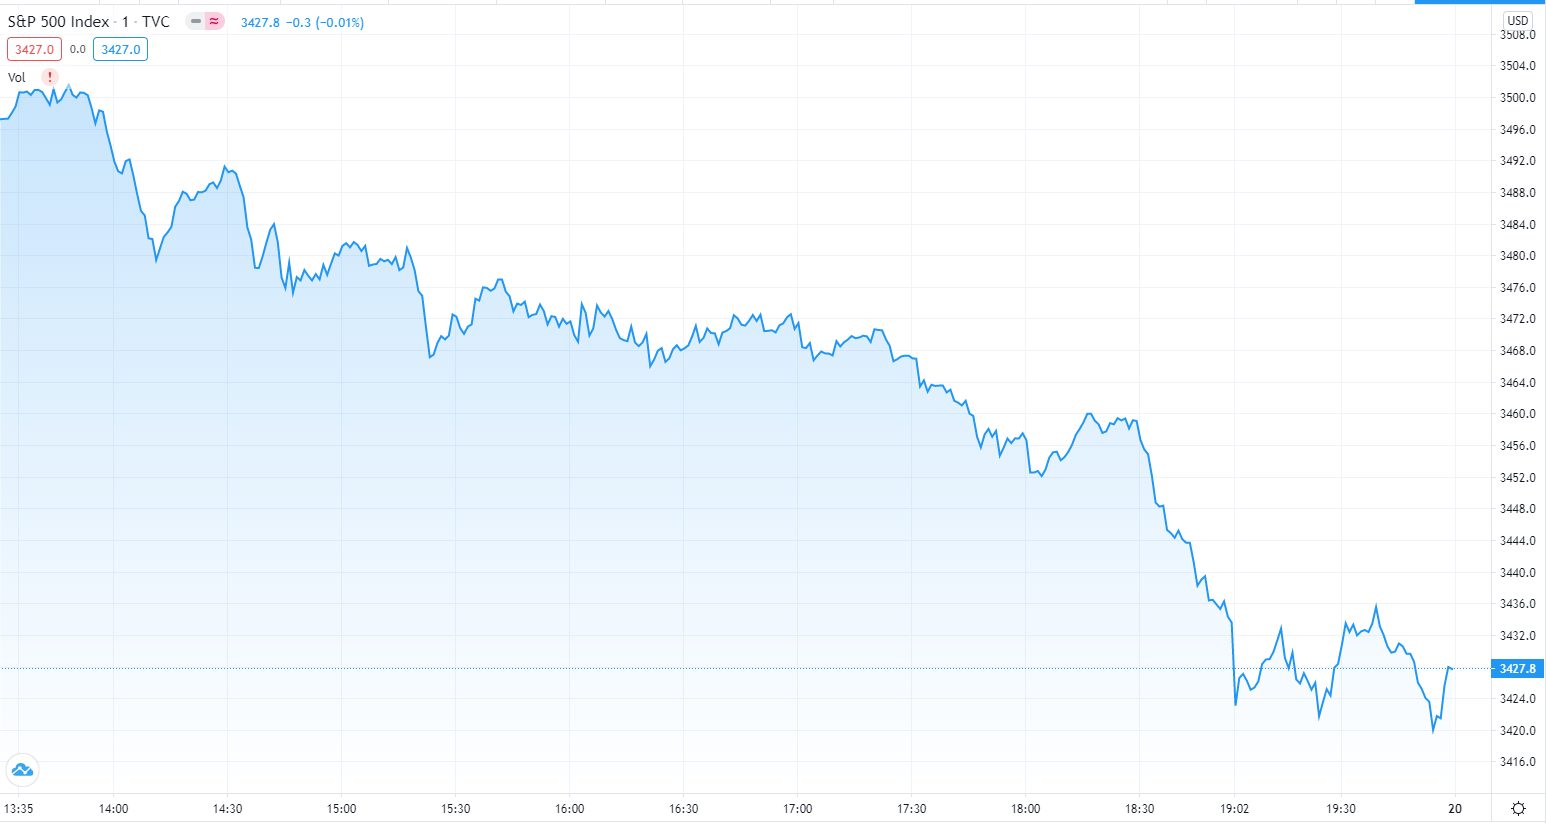 Bitcoin Barrels Toward $12K as Investors Eye Decoupling From S&P 500